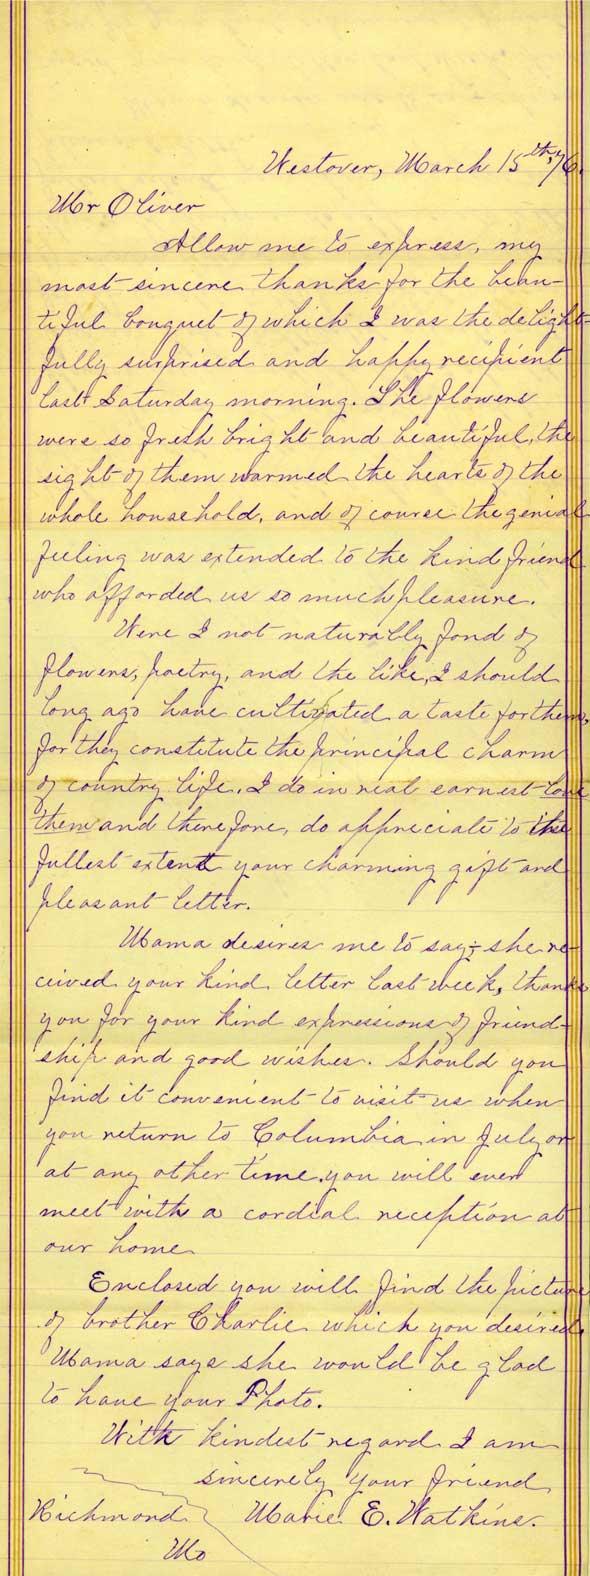 Letter from Marie Watkins to Robert Burett Oliver.